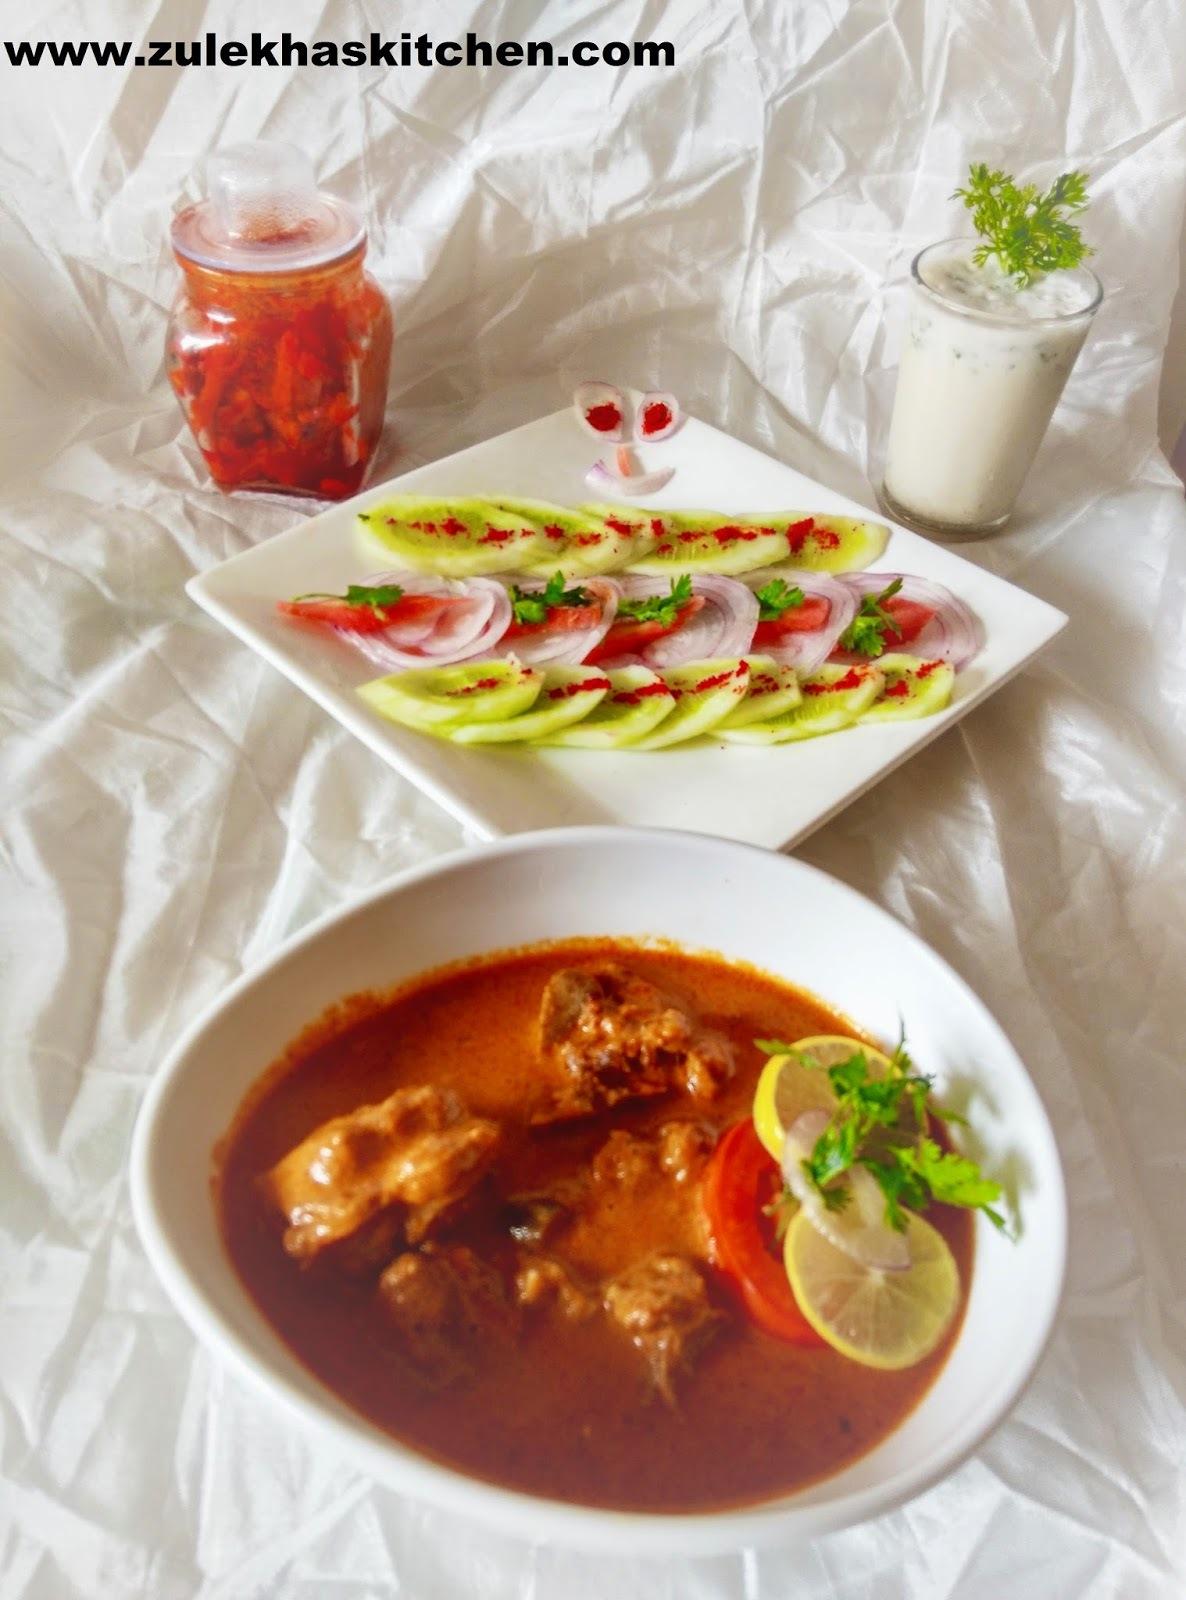 Recipe of shahi mutton korma